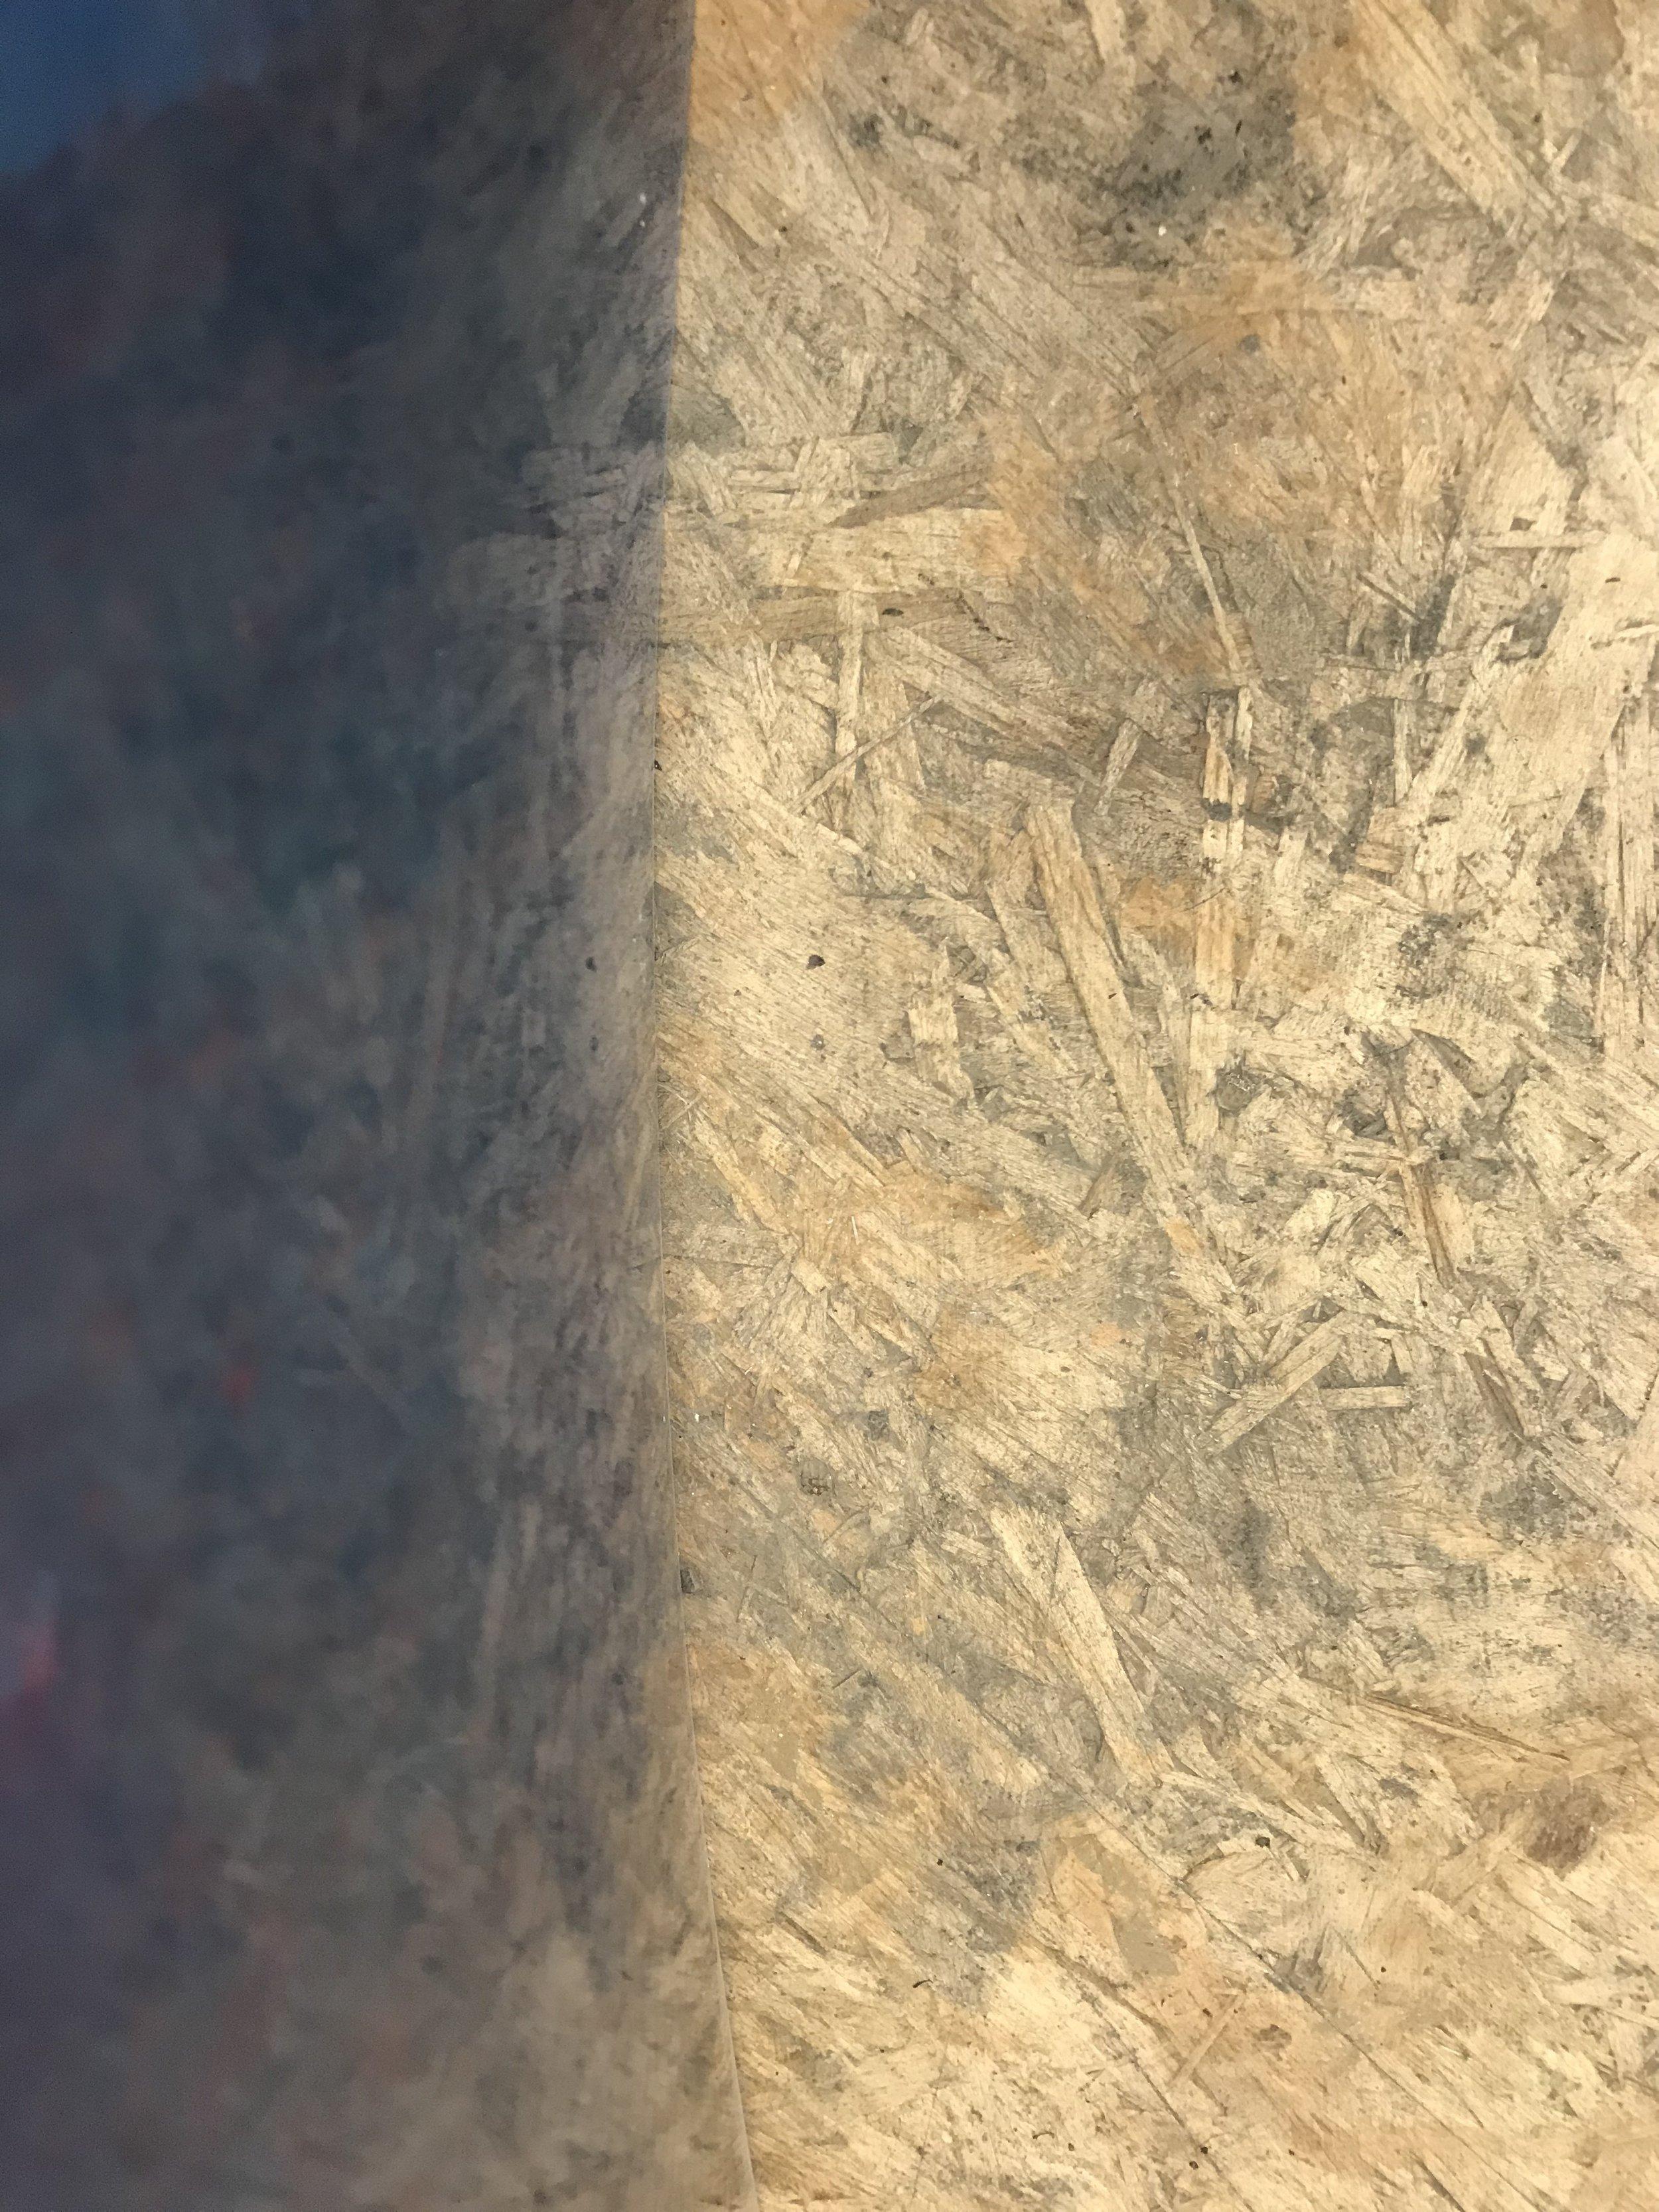 osb floors lay tangent to Fiberglass Bellies